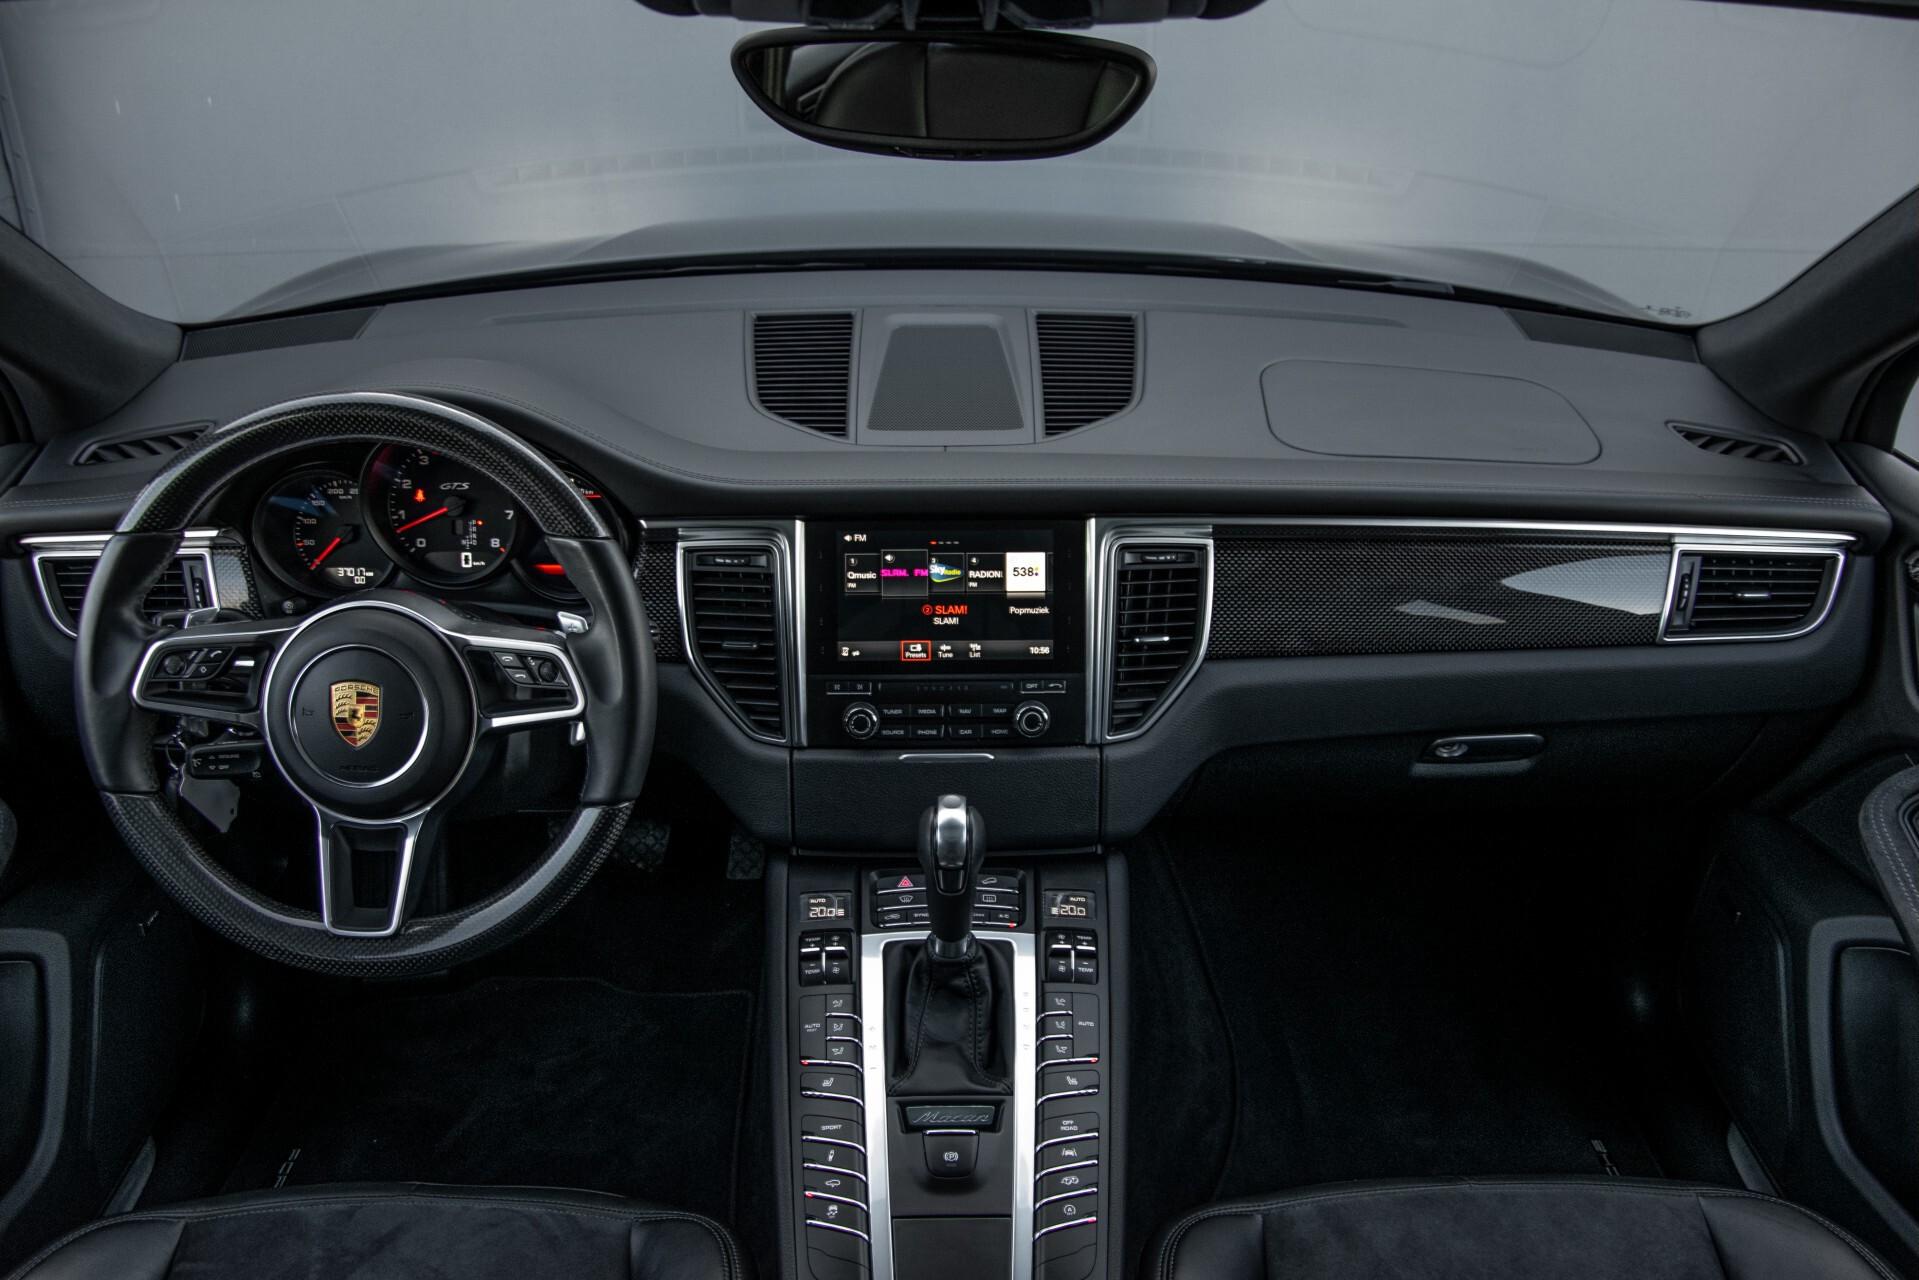 Porsche Macan 3.0 GTS Luchtvering/Panorama/Carbon/Bose/360-camera/Memory/PDLS Aut7 Foto 8